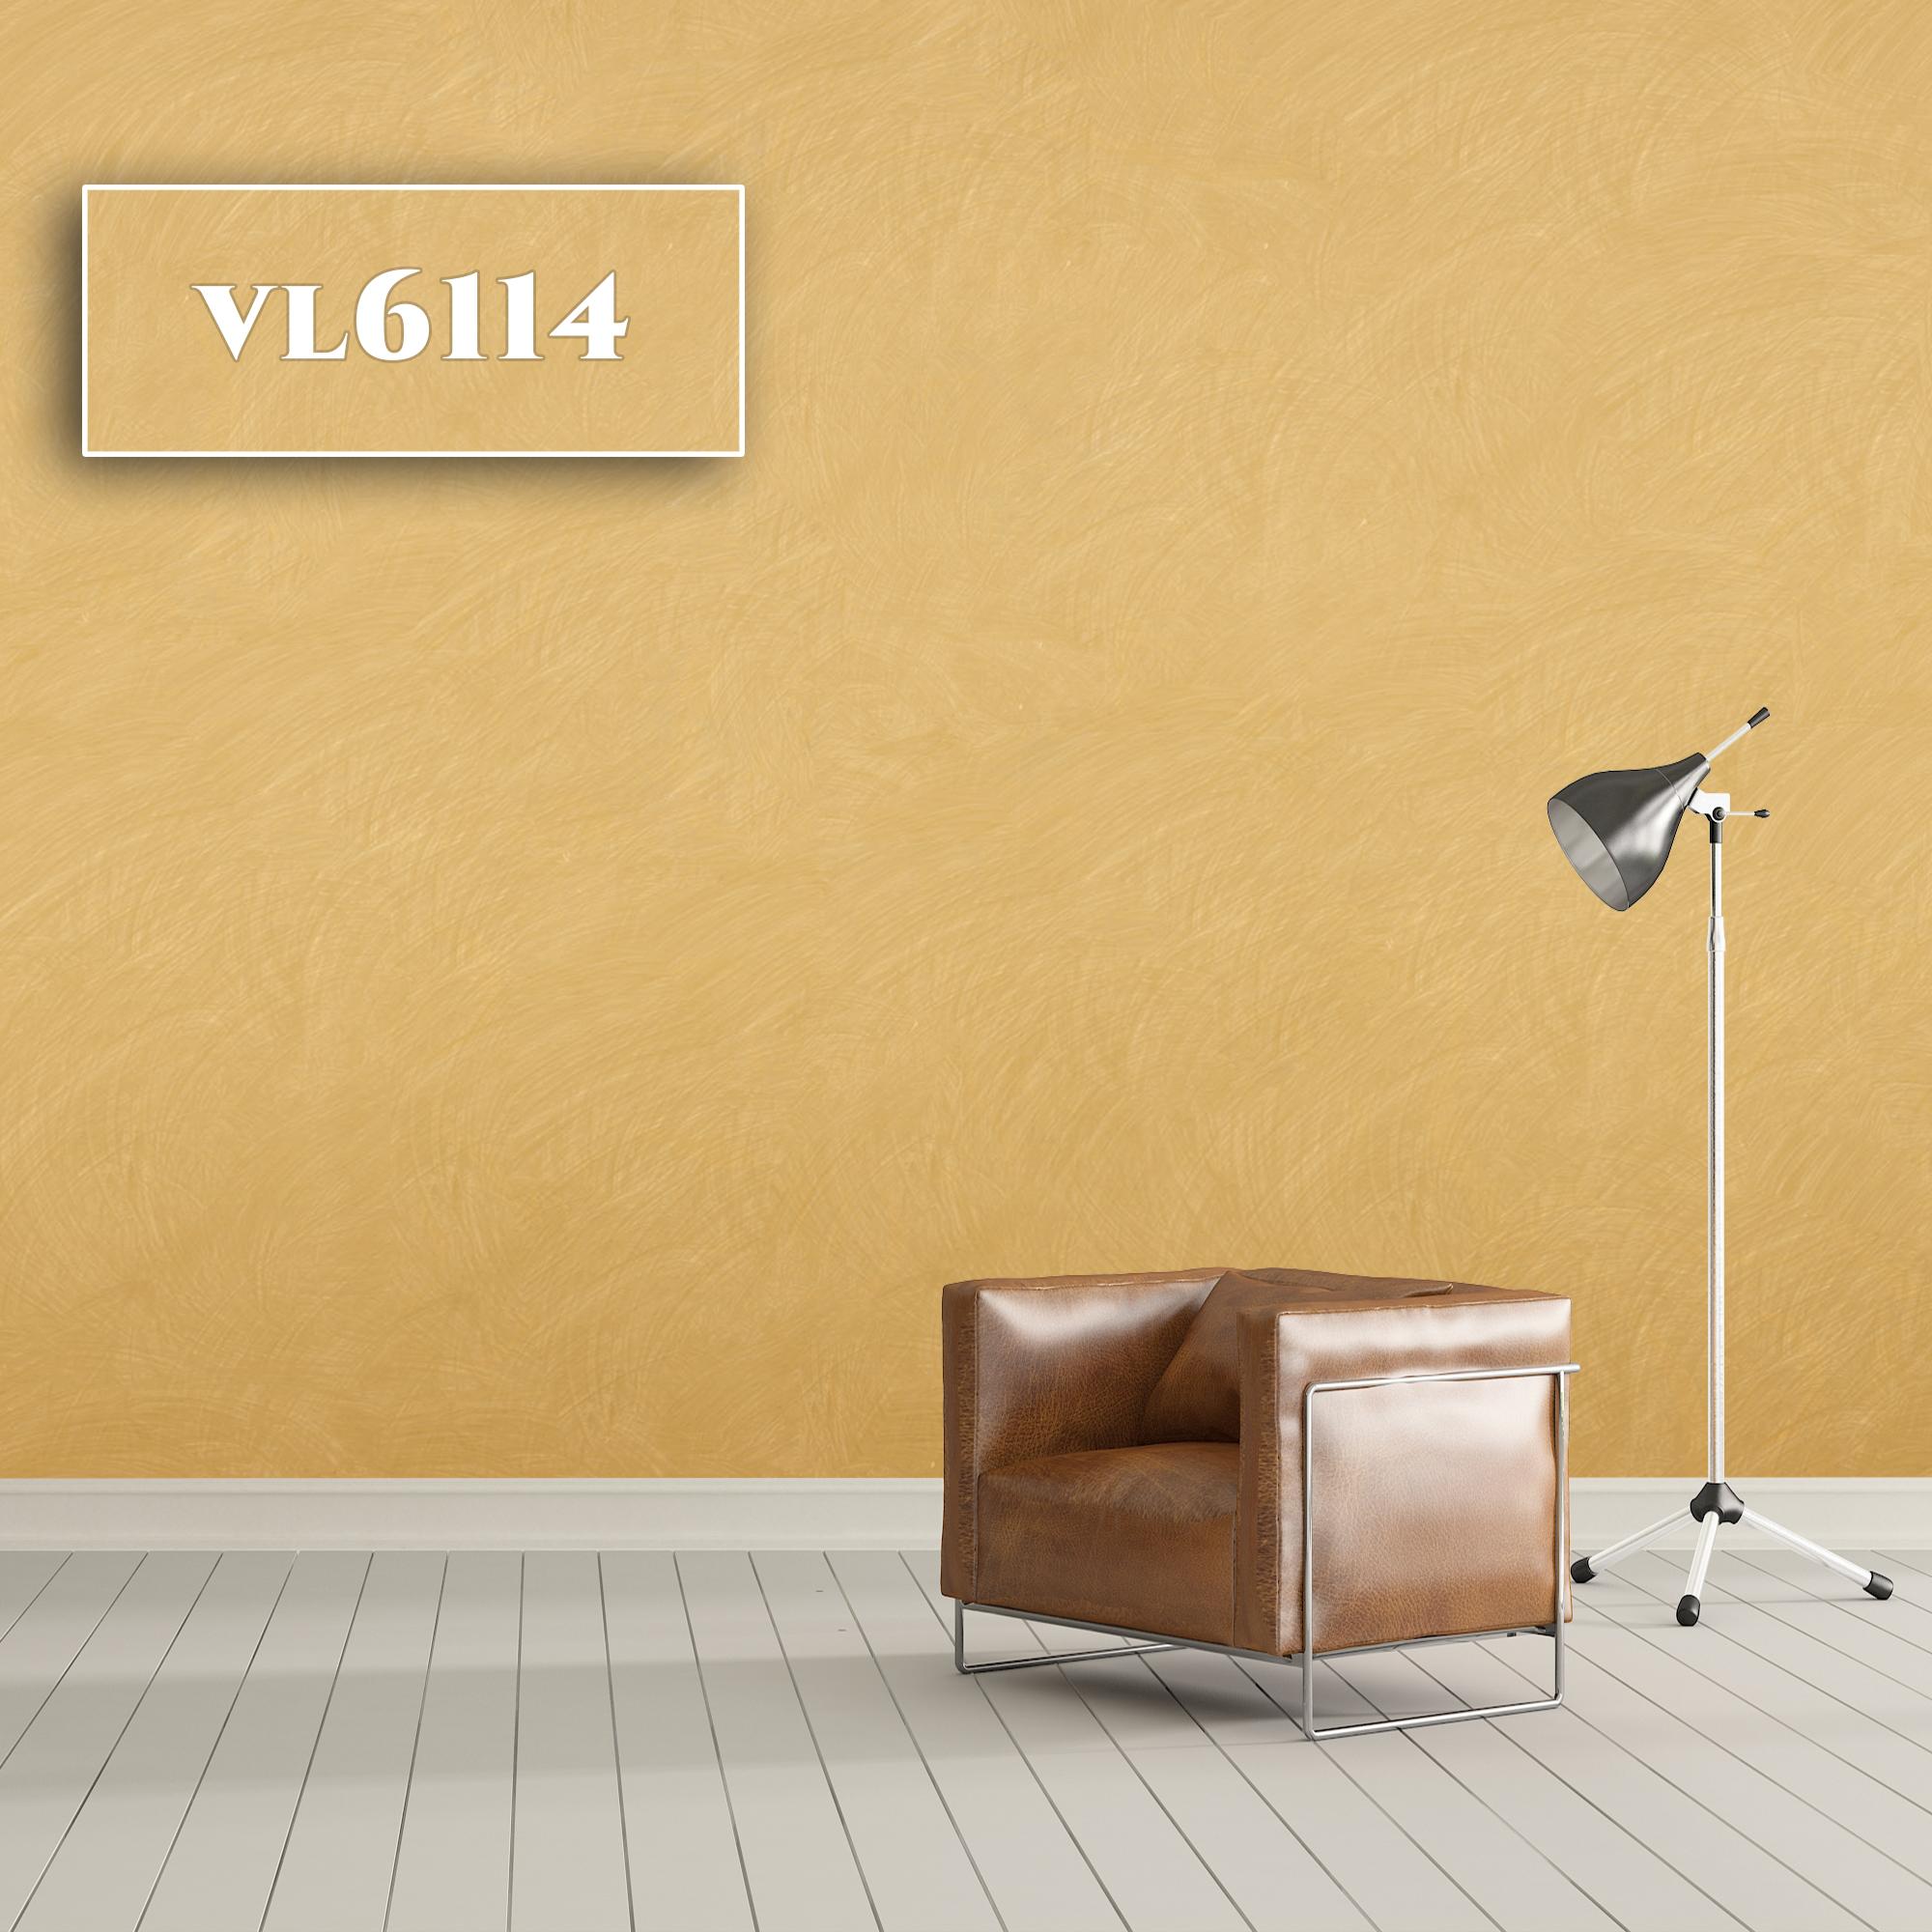 VL6114